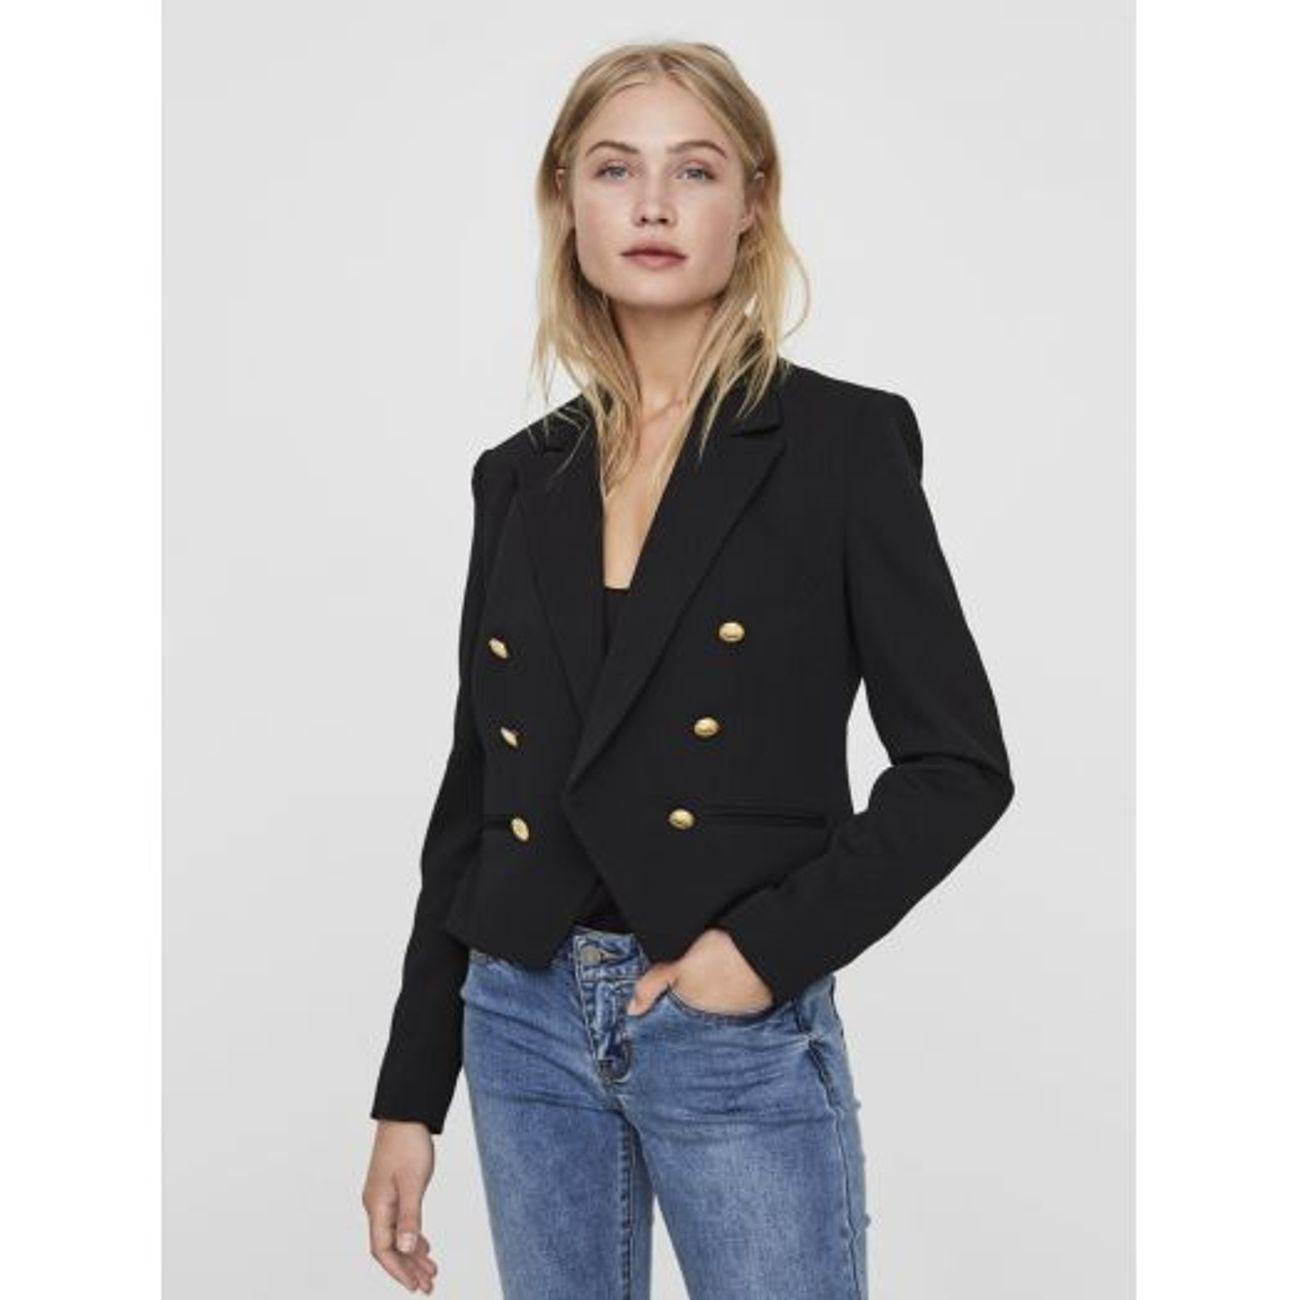 53a5bfc61fee3 Mode- Lifestyle adulte VERO MODA Blazer Femme Vero Moda Selma D2-5 Noir ...